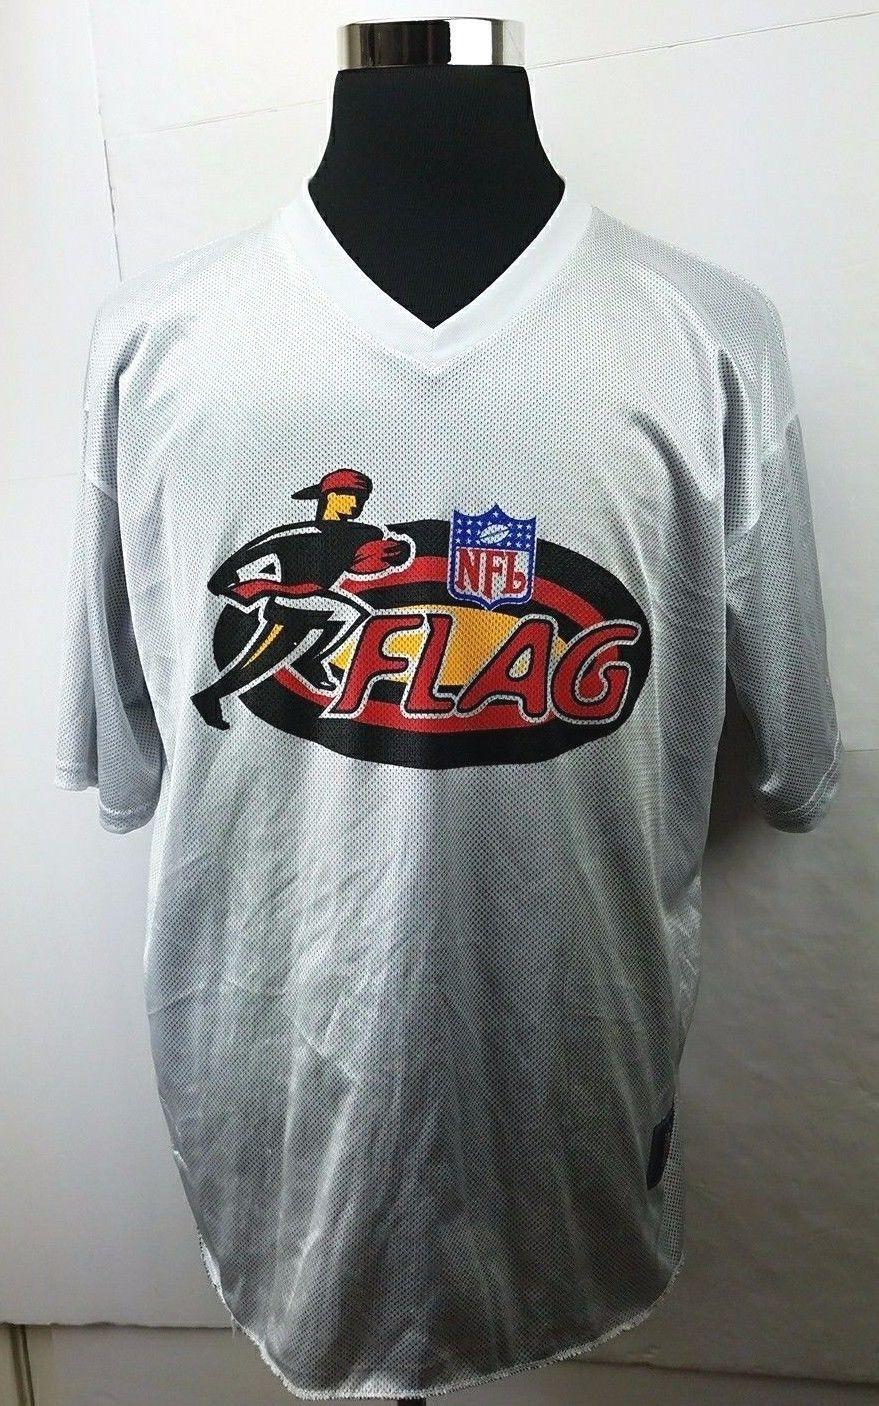 71ce7a7a3 Vintage Men's Nike NFL Flag Football Black/White Reversible Jersey Size: XL